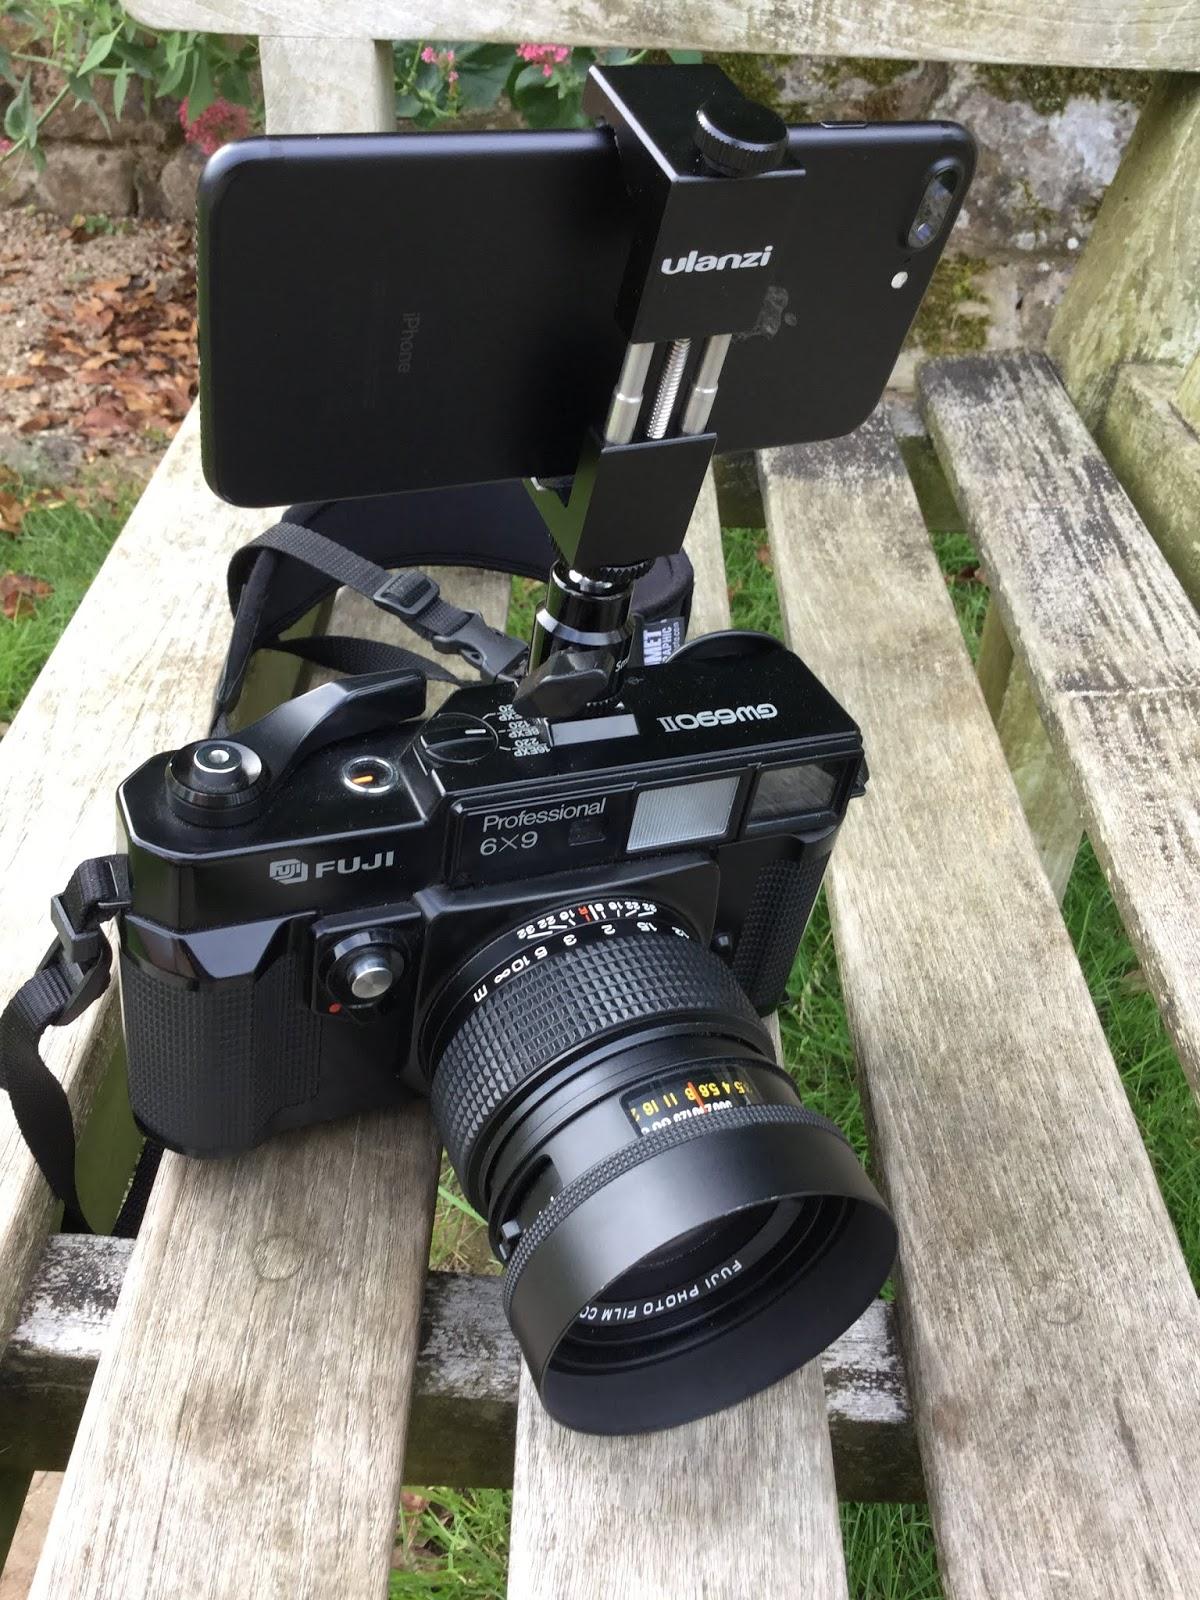 Real Medium Format - Fuji 6 x 9  The 'Texas Leica'  | SOUNDIMAGEPLUS